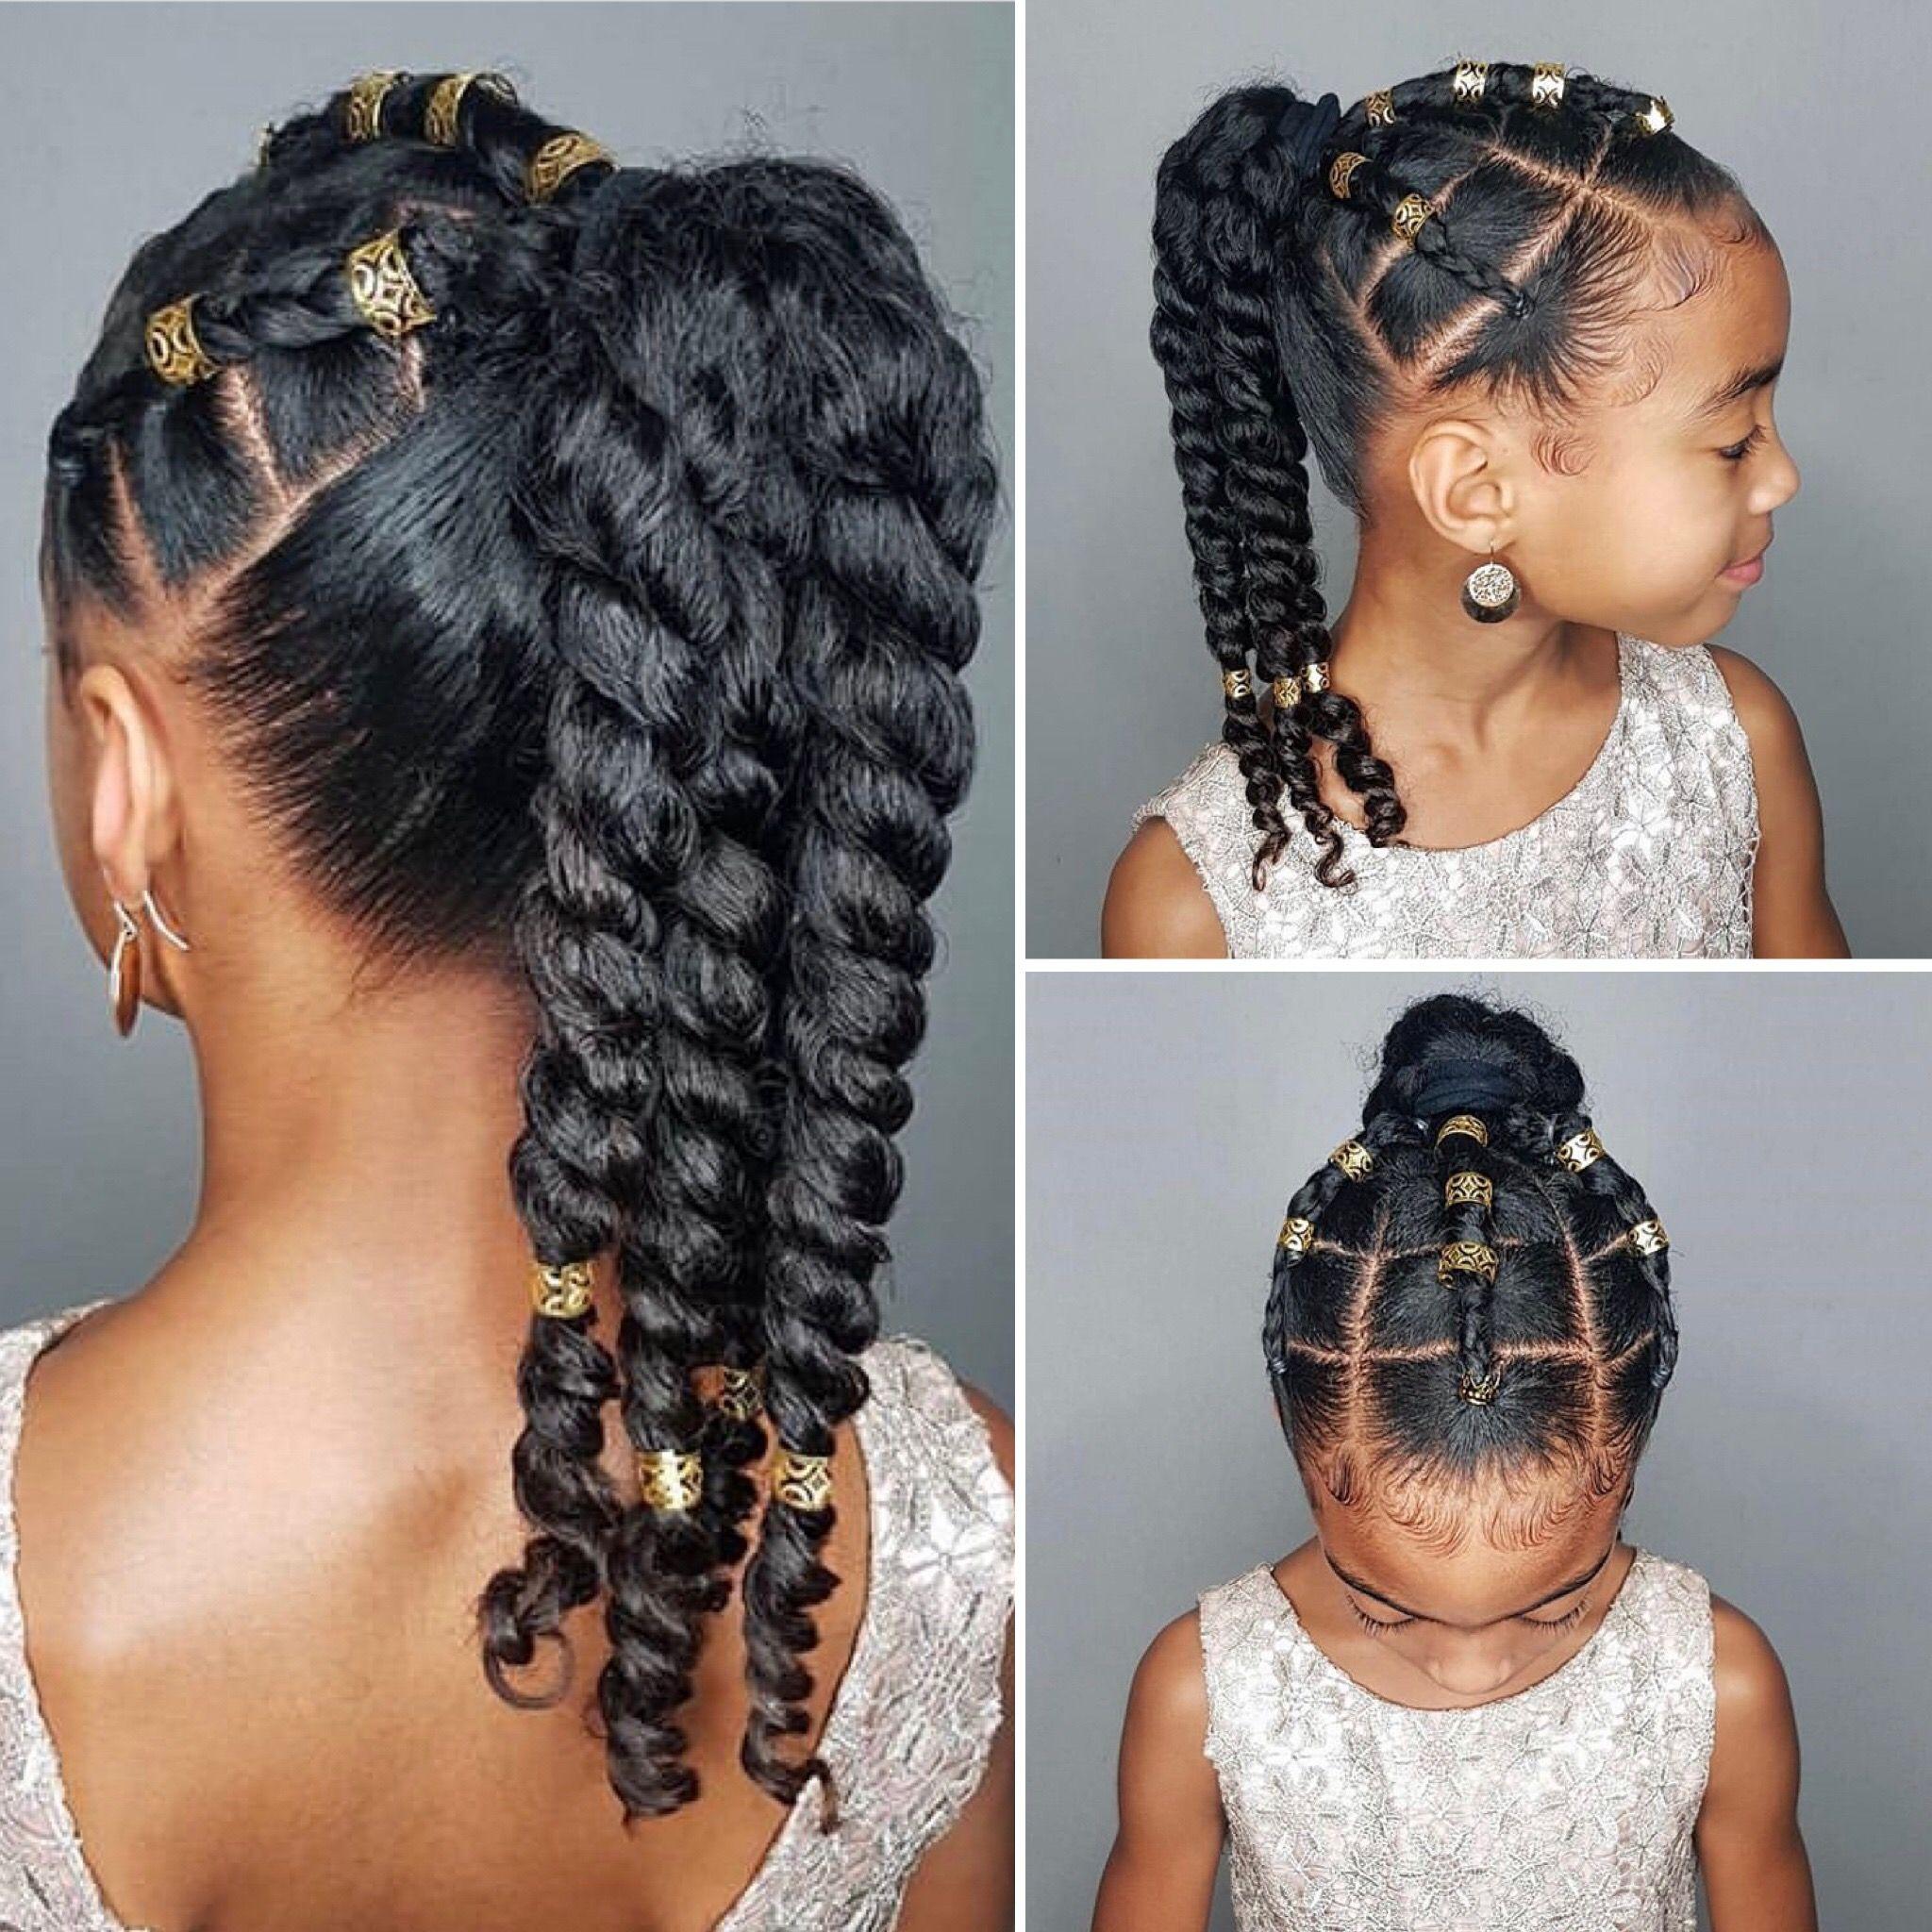 Riityeyayeѕt Eurodolls Girls Natural Hairstyles Natural Hairstyles For Kids Natural Hair Updo